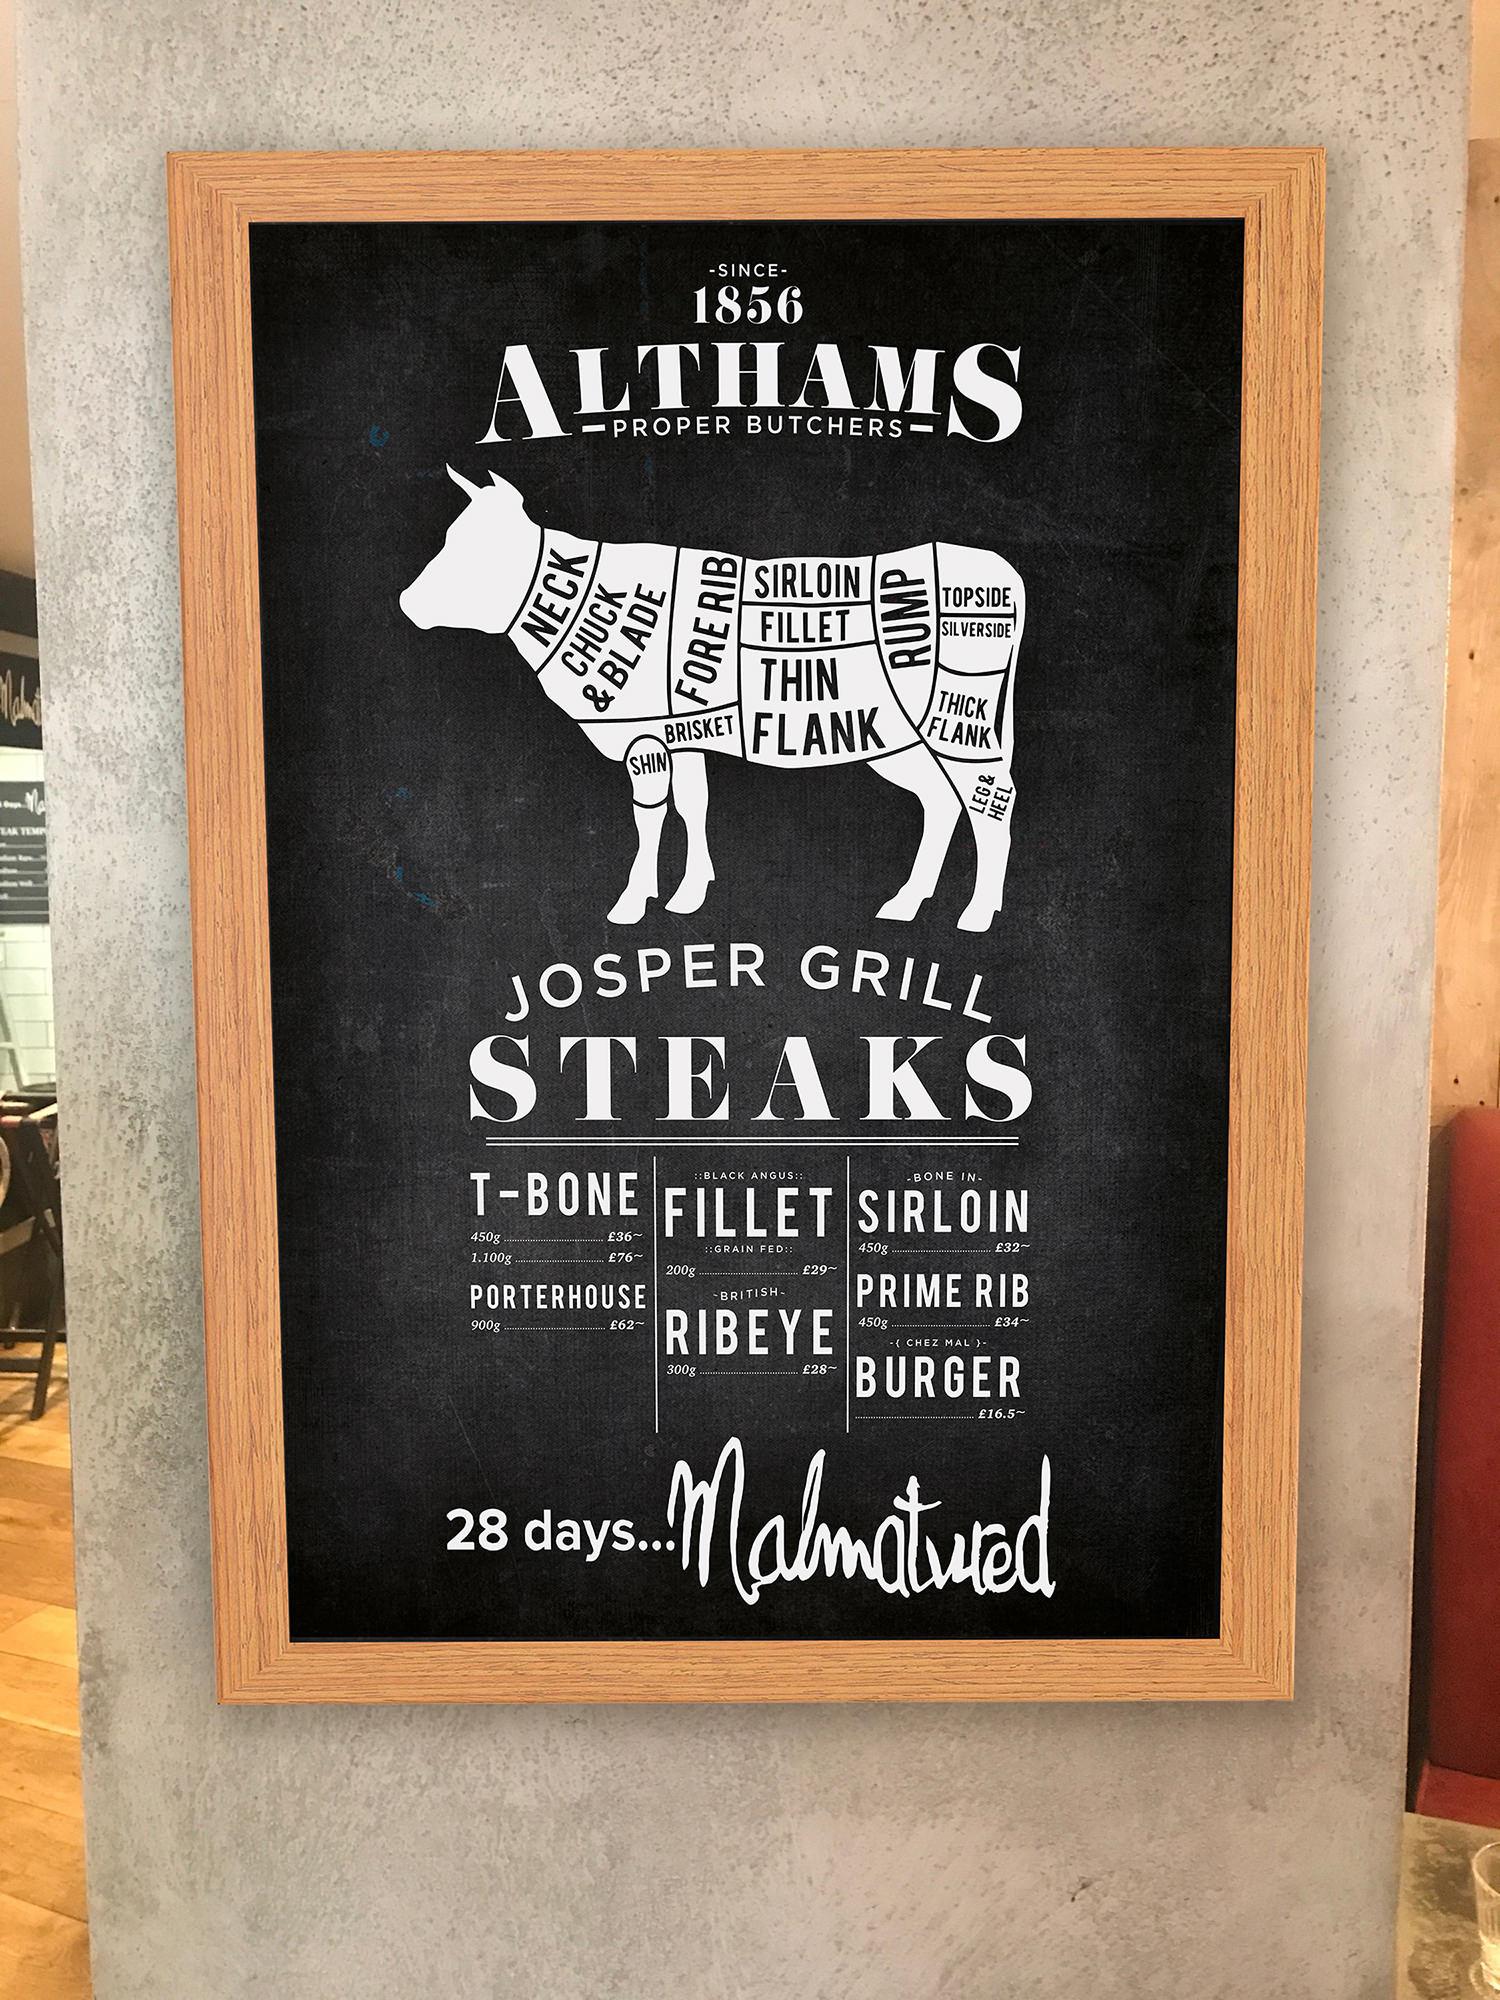 Malmaison-Althams-Big-Blond-Bear-Branding-12.jpg